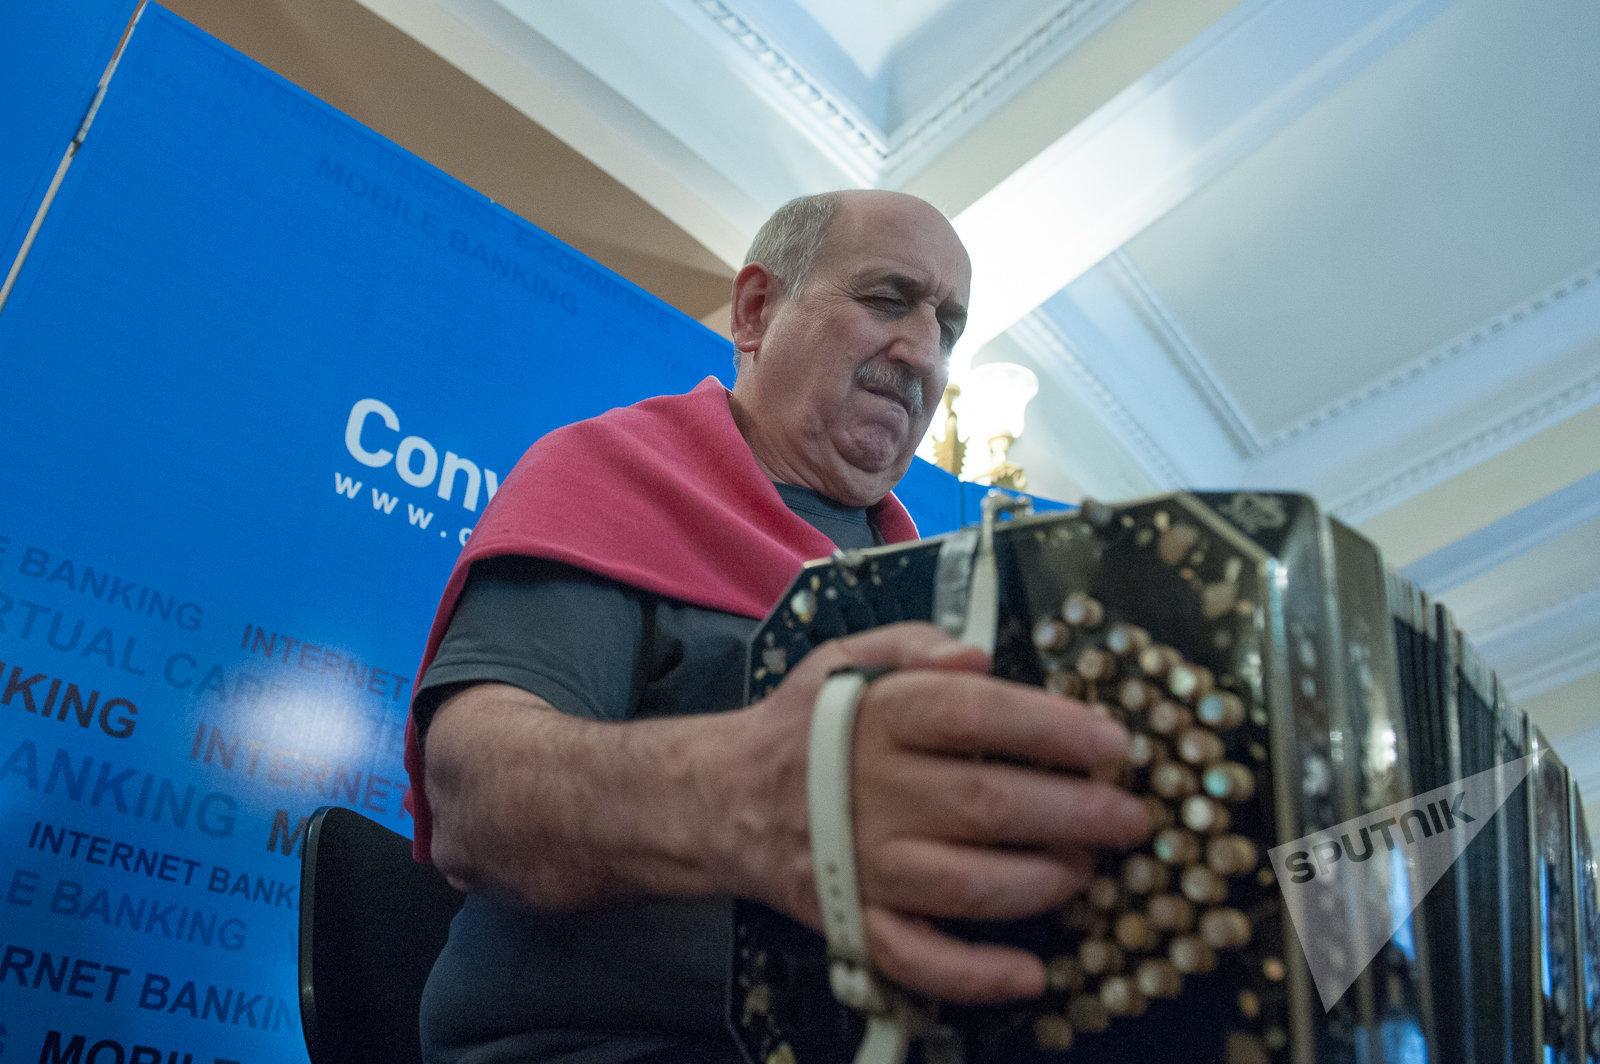 Дирижер и бандонеонист Карлос Буоно в Ереване